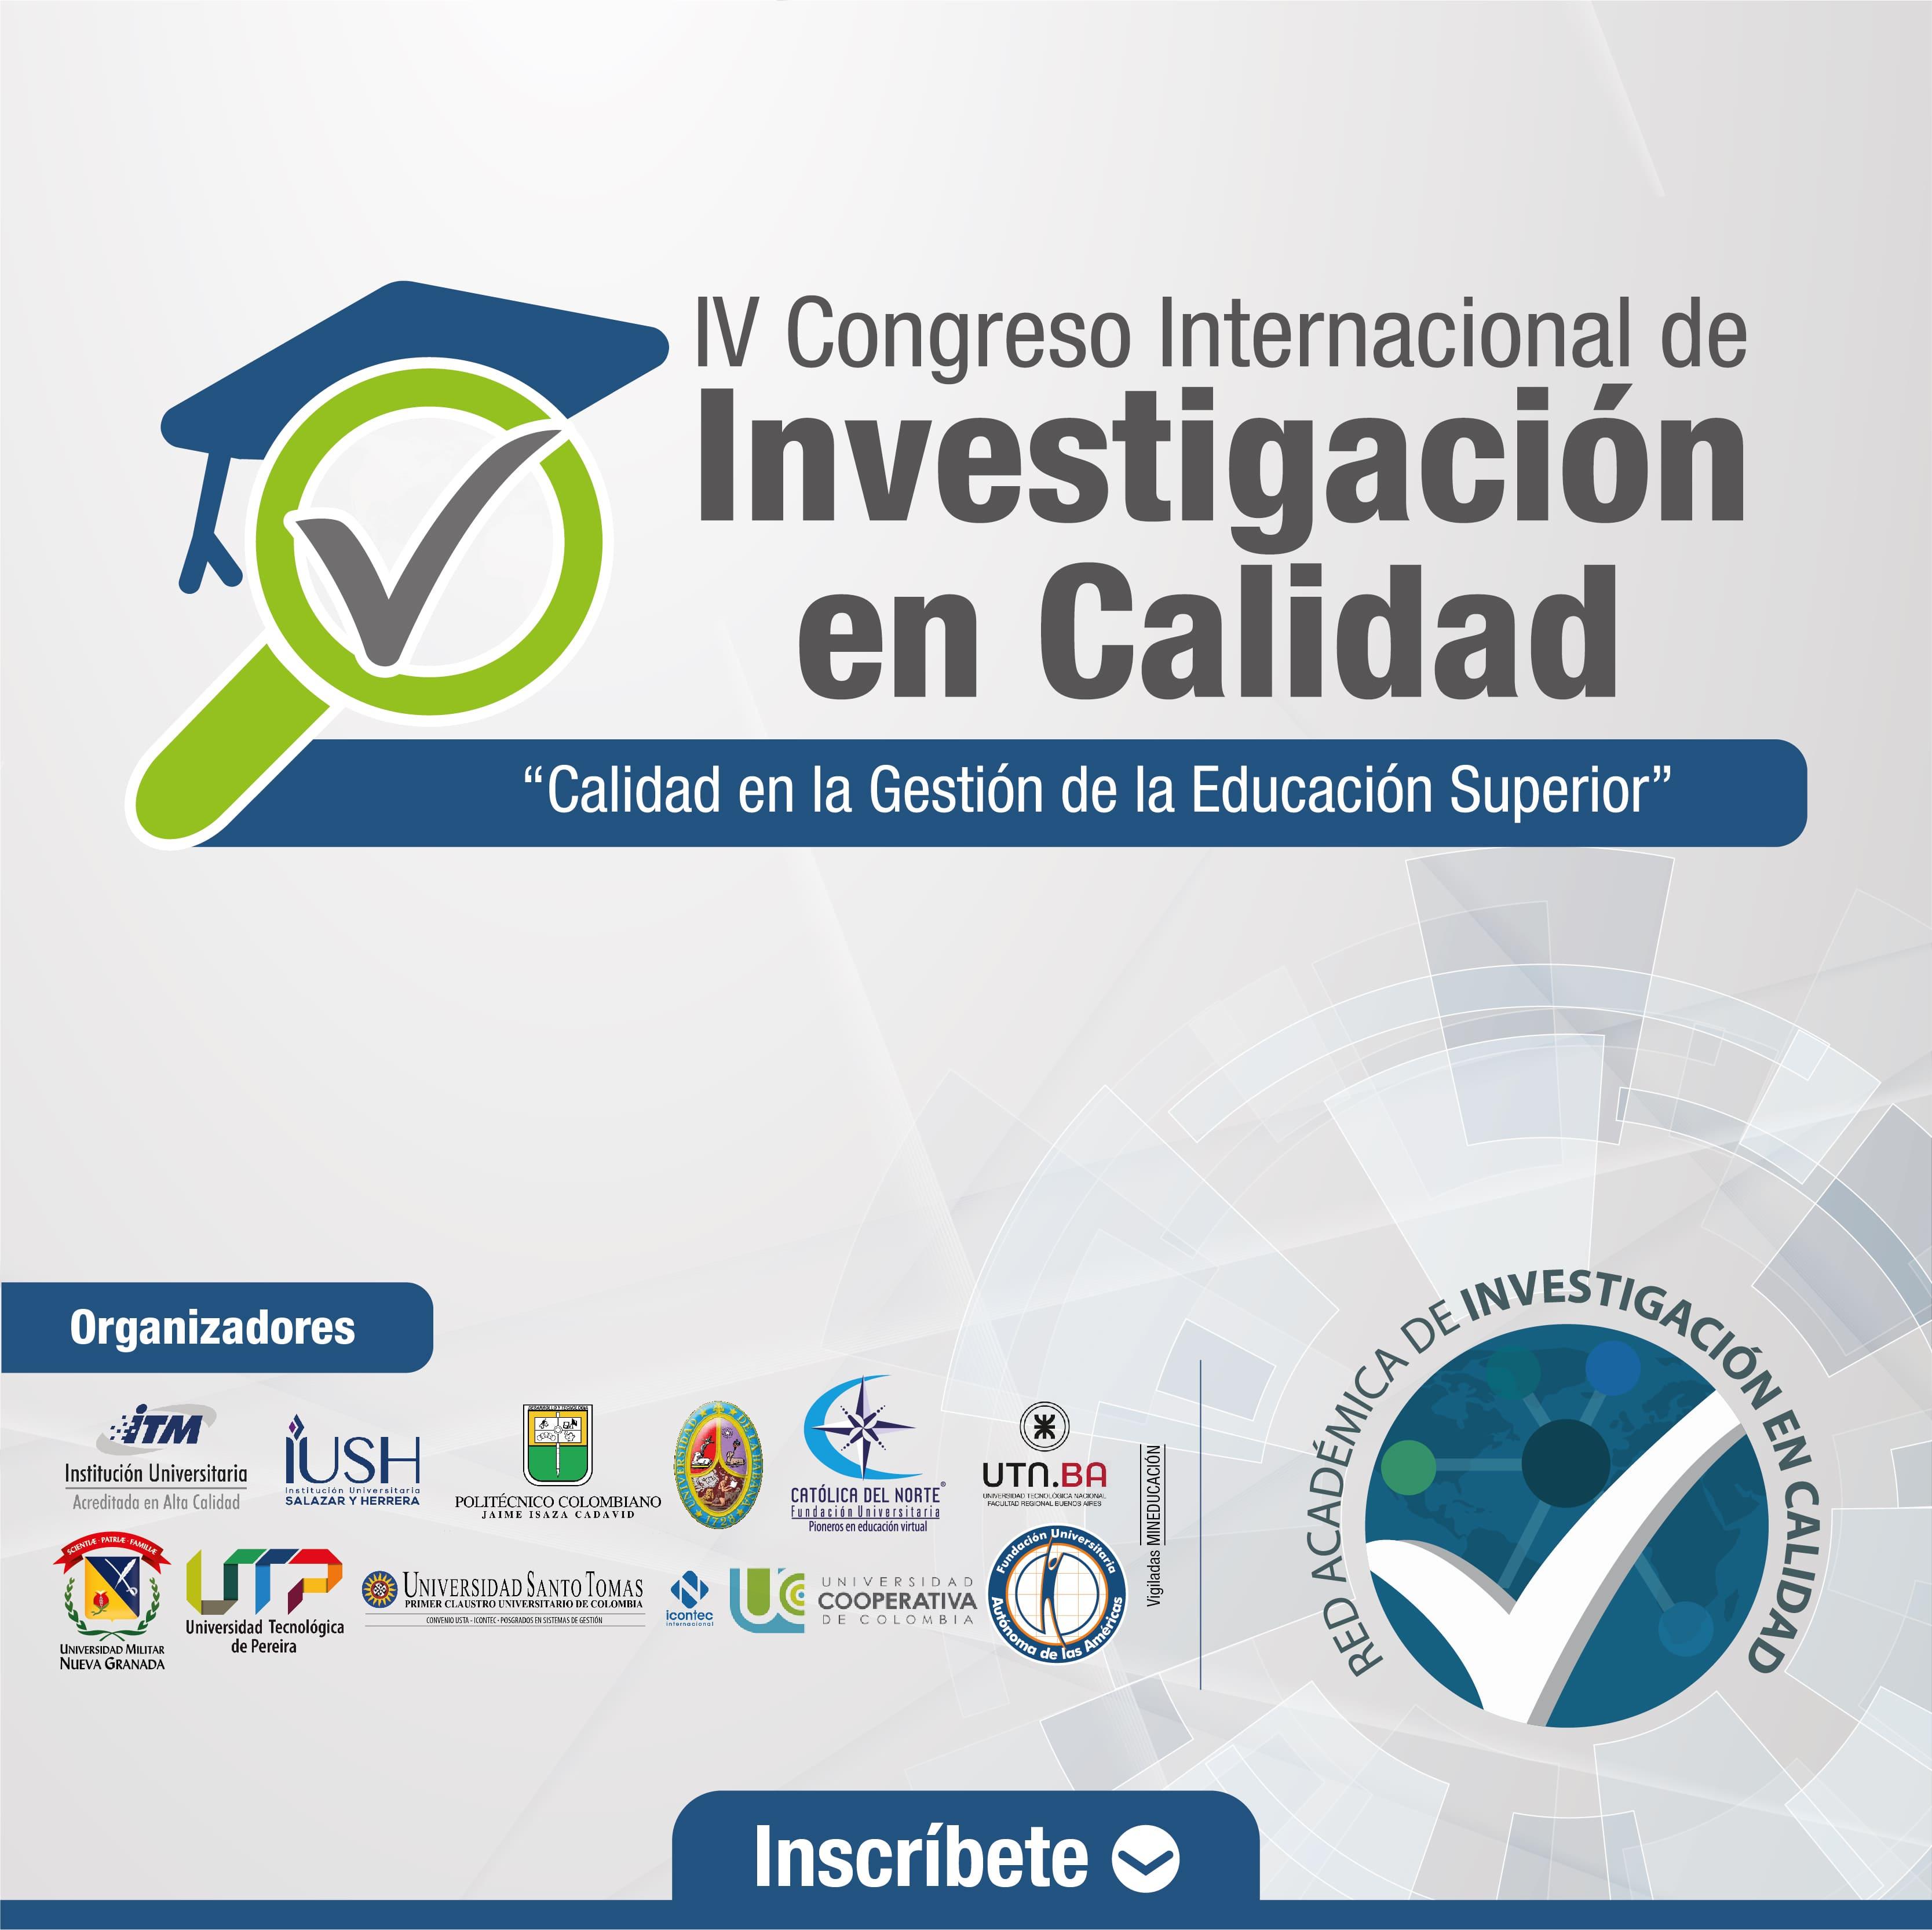 IV Congreso Internacional de Investigación en CalidadIUSH